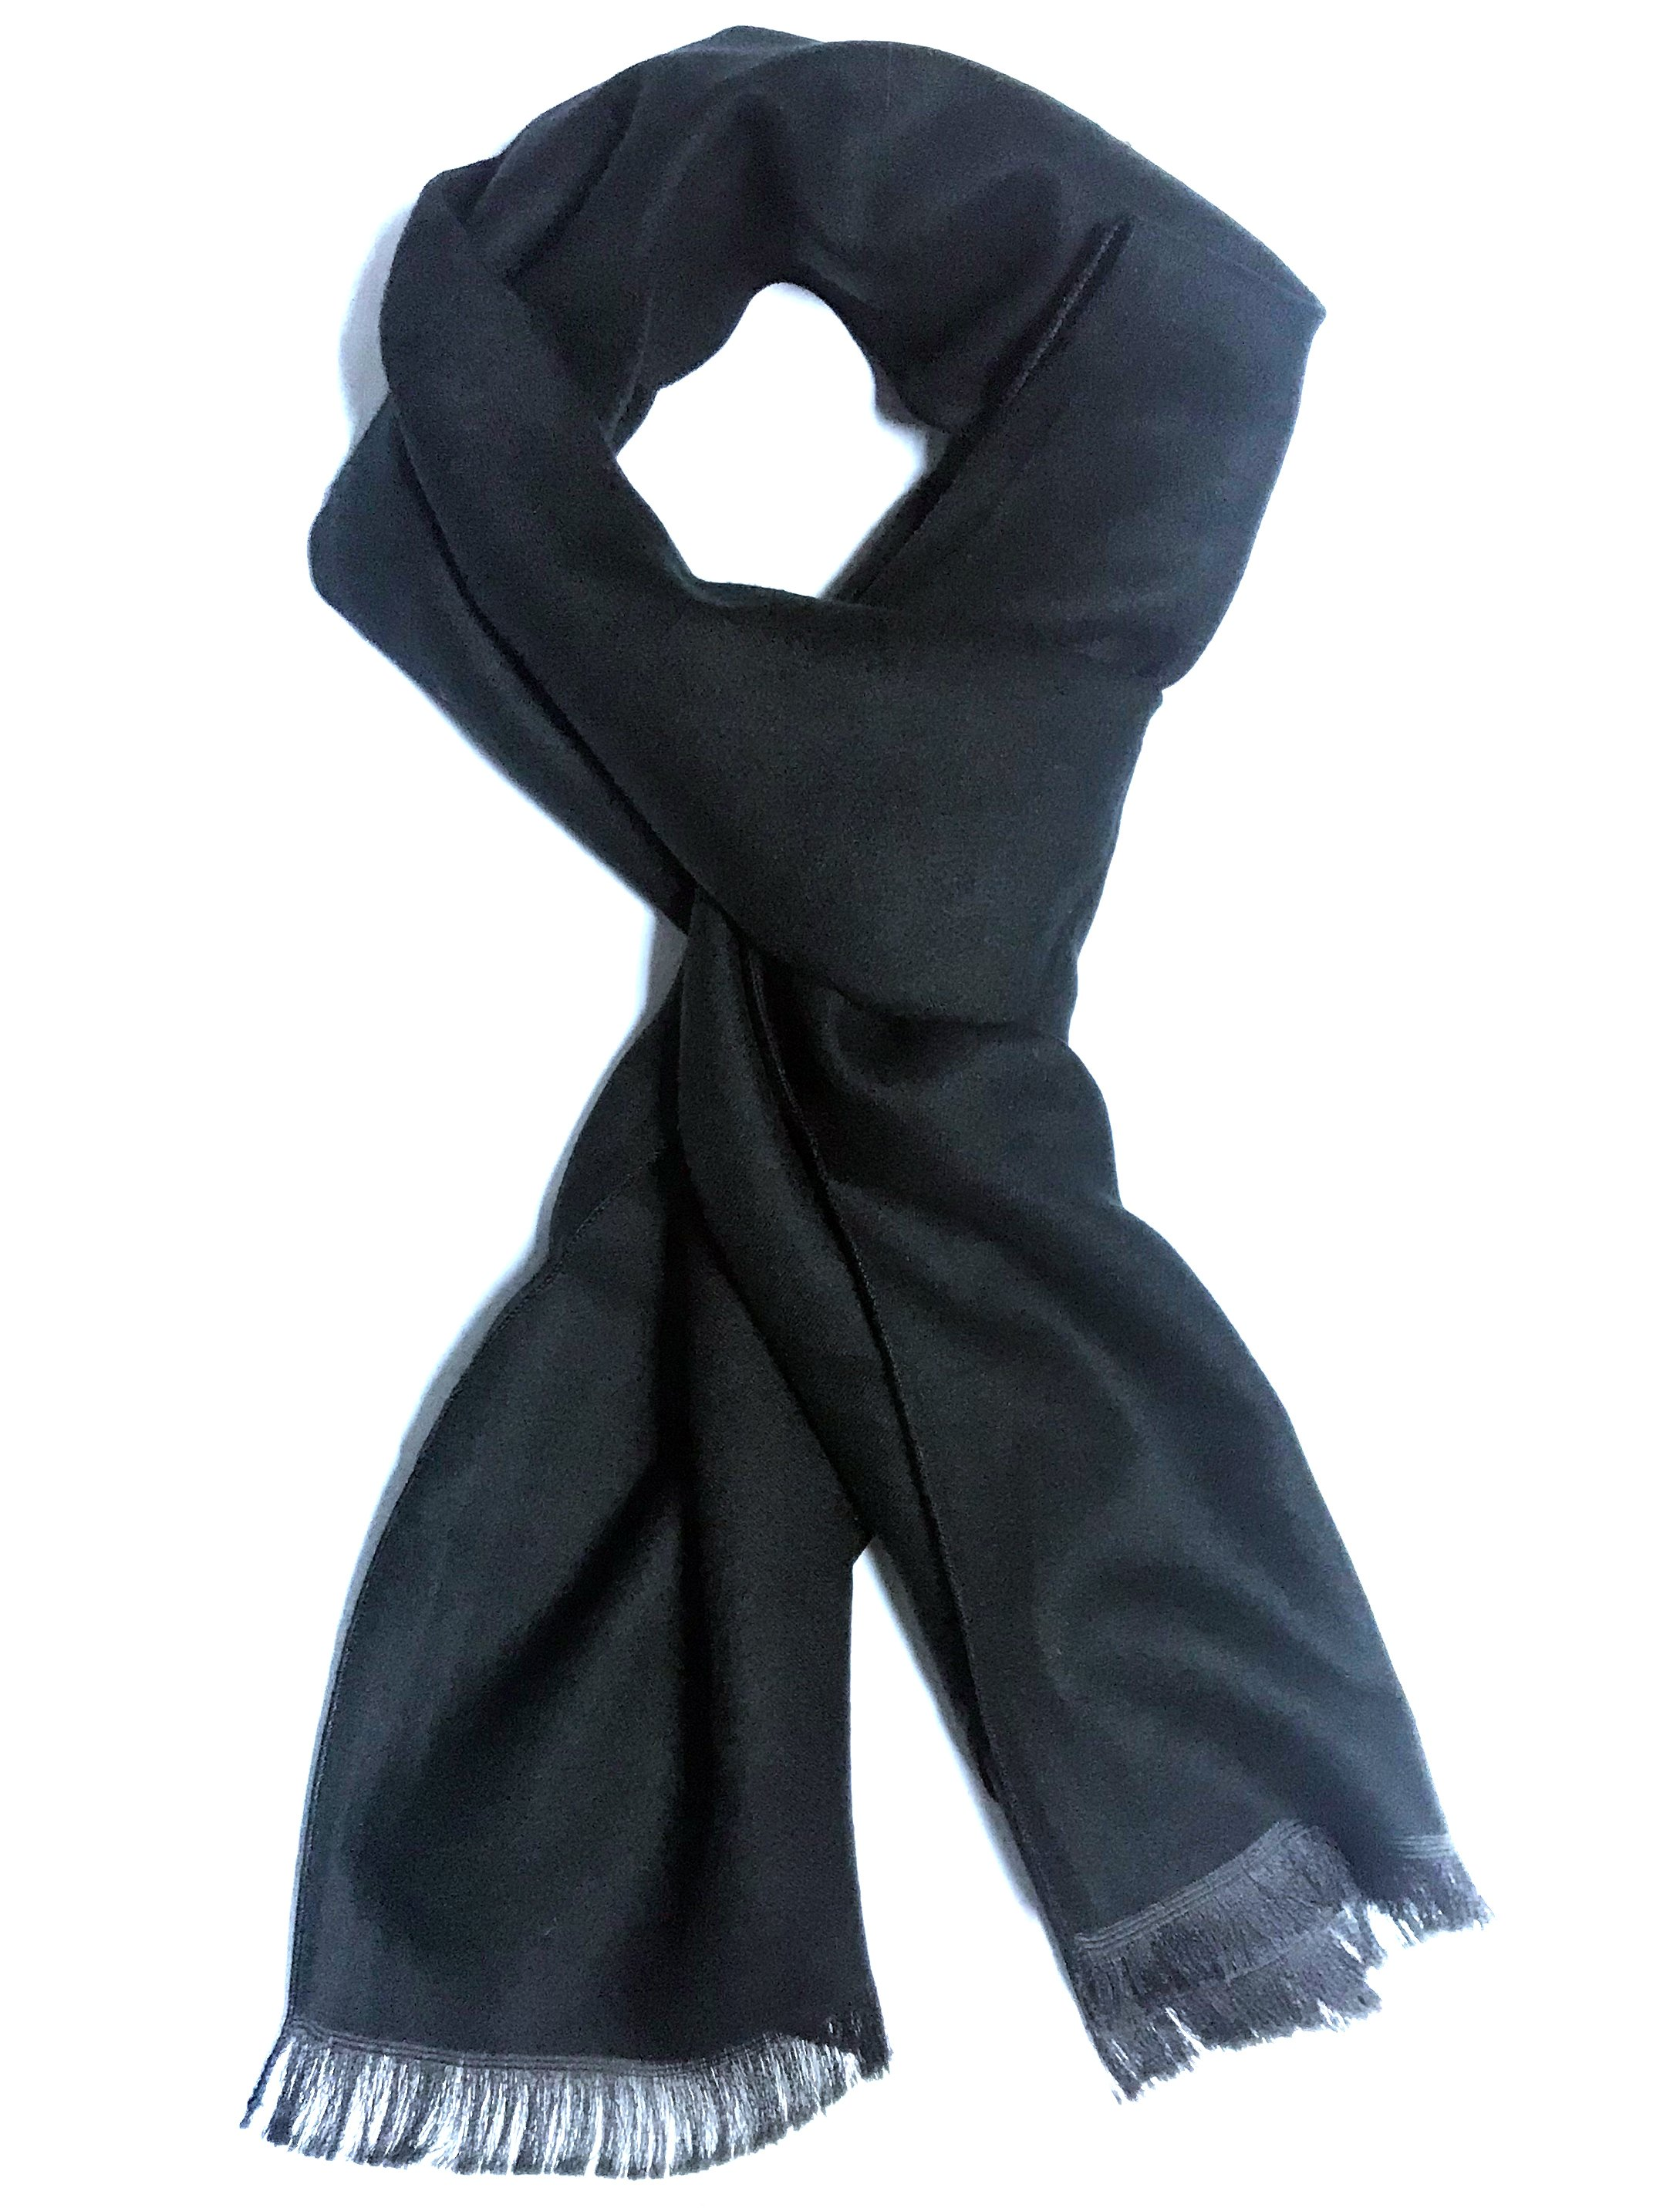 Fular casmir negru uni